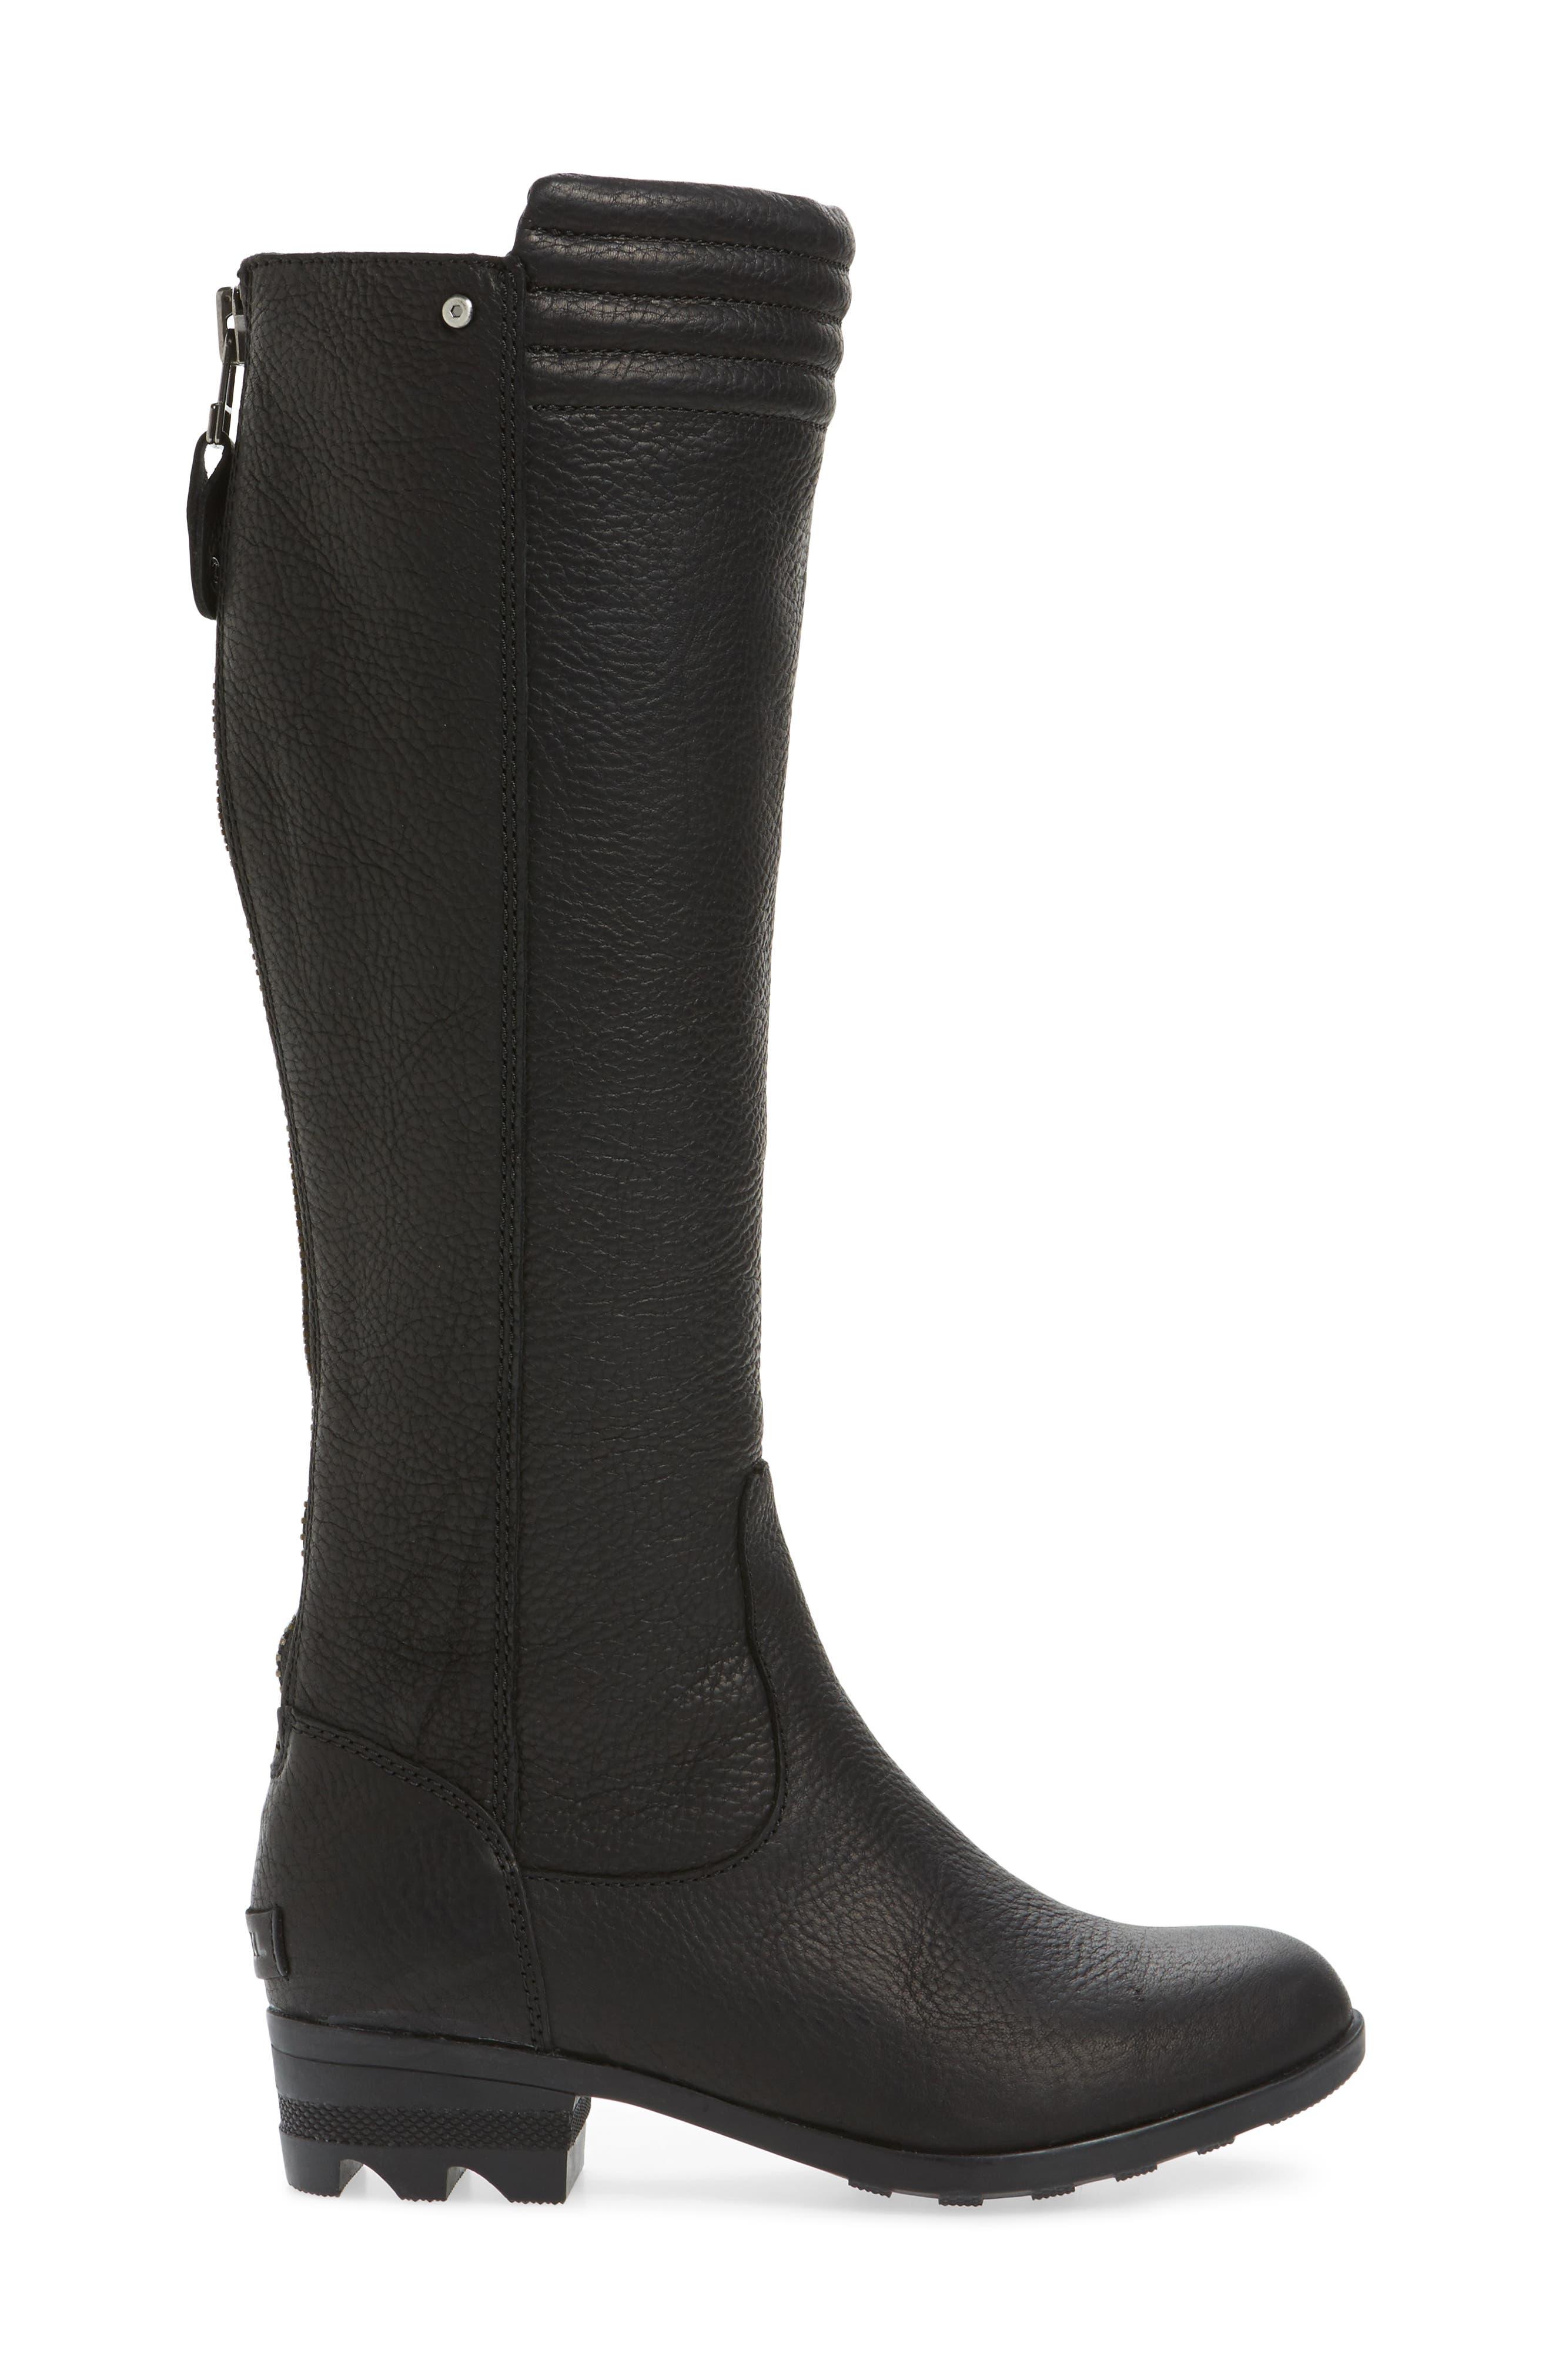 Danica Waterproof Knee High Boot,                             Alternate thumbnail 3, color,                             010